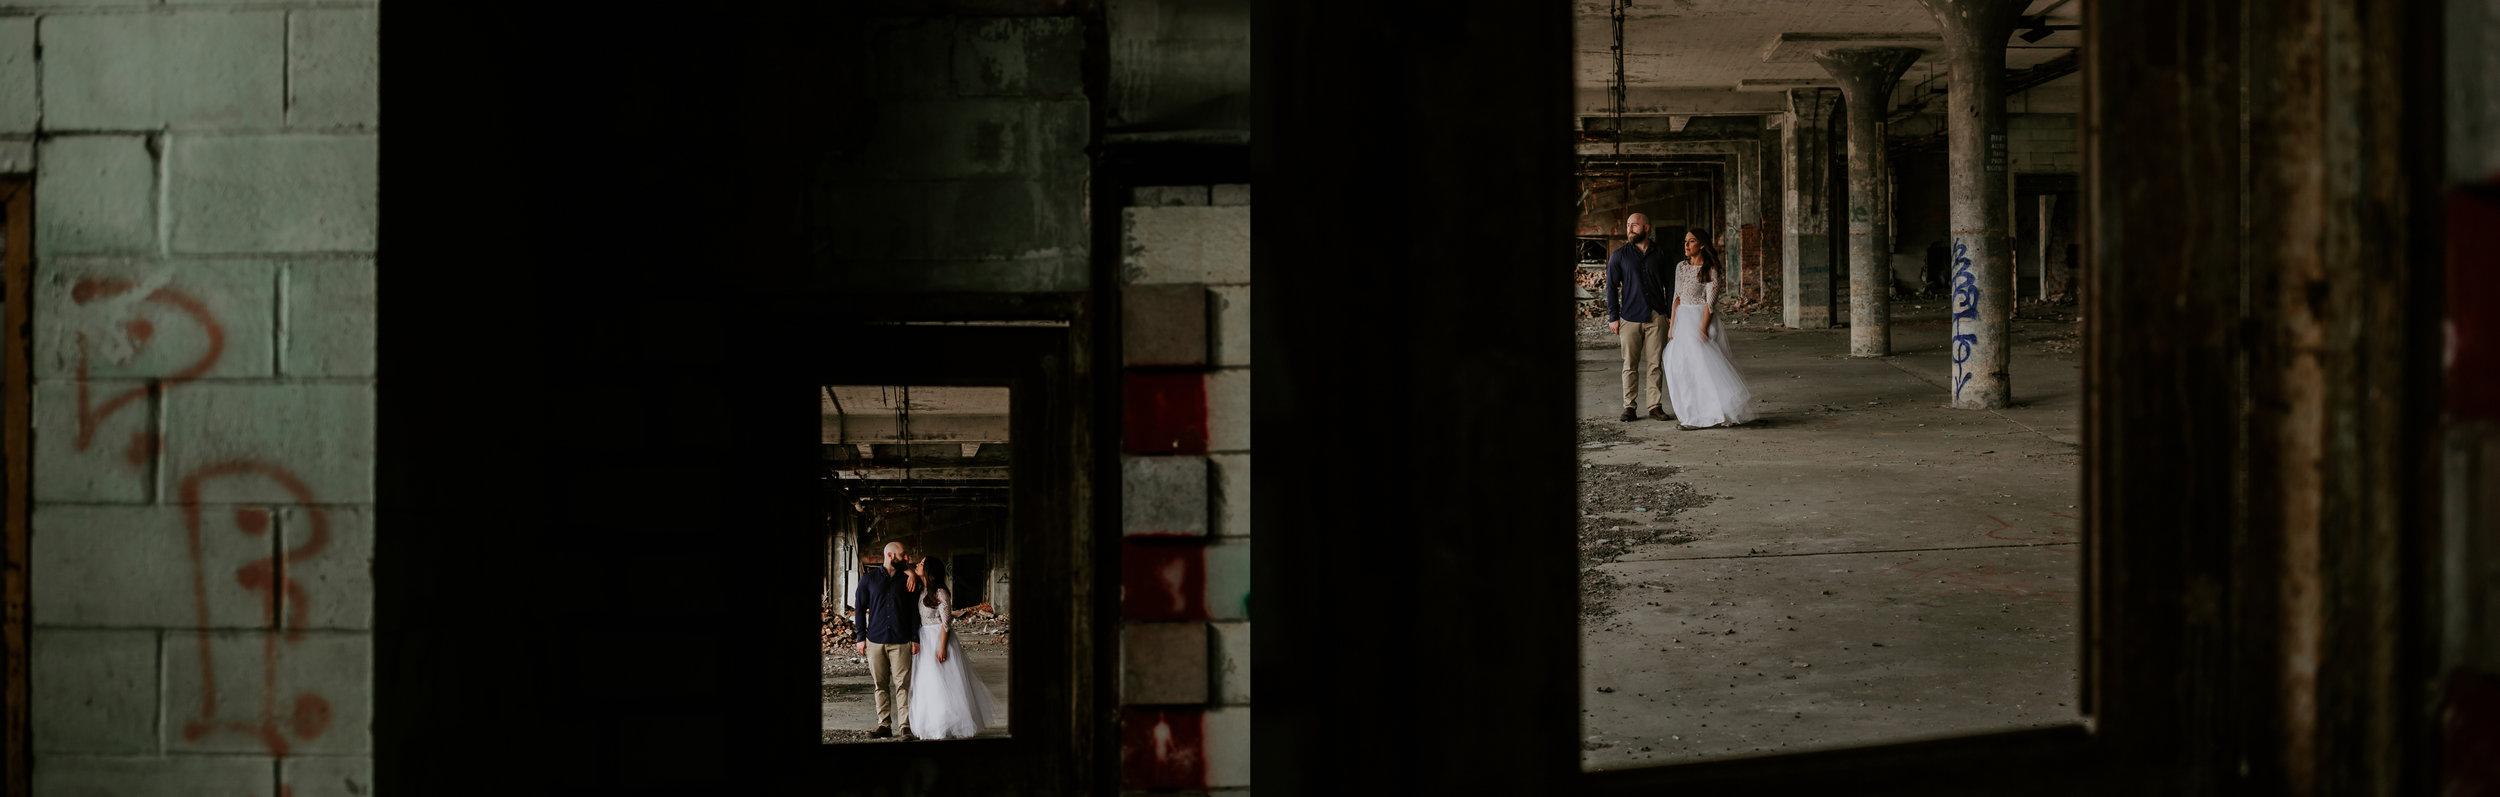 central terminal engagment wedding photography buffalo ny (3 of 54).jpg